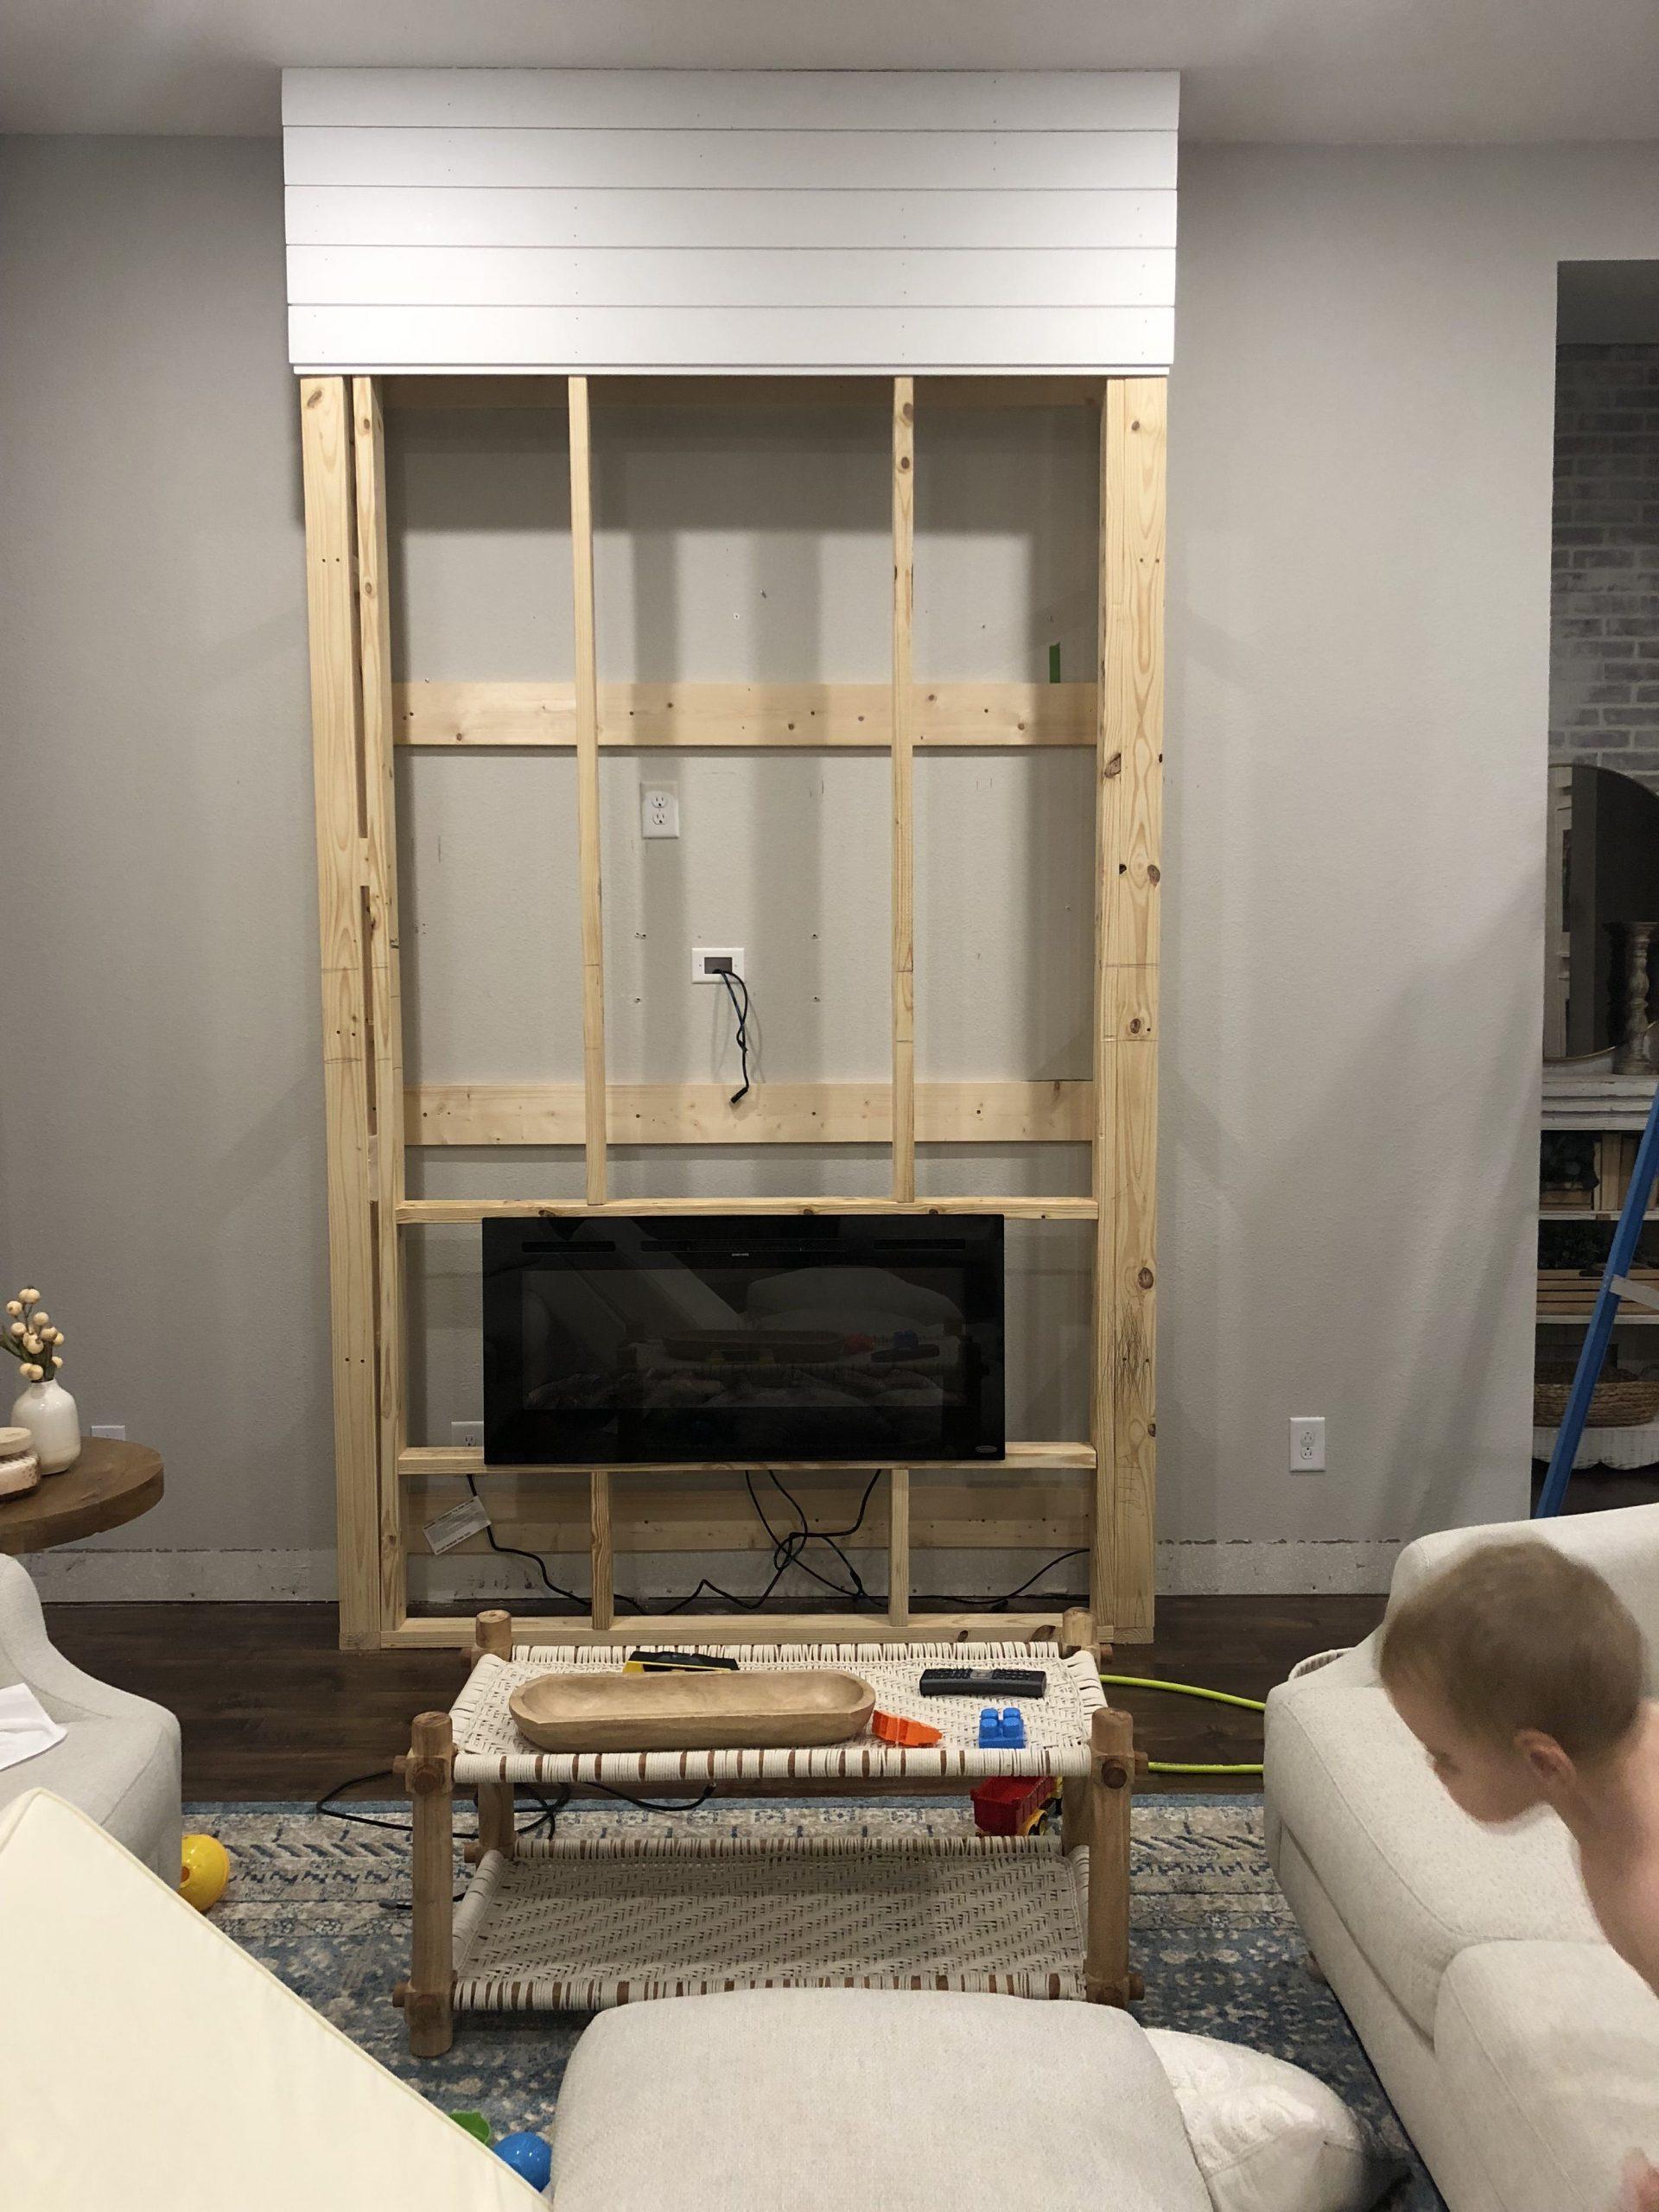 Vonderhaar Fireplace Inspirational Installing A Fireplace Our New Samsung Frame Tv the